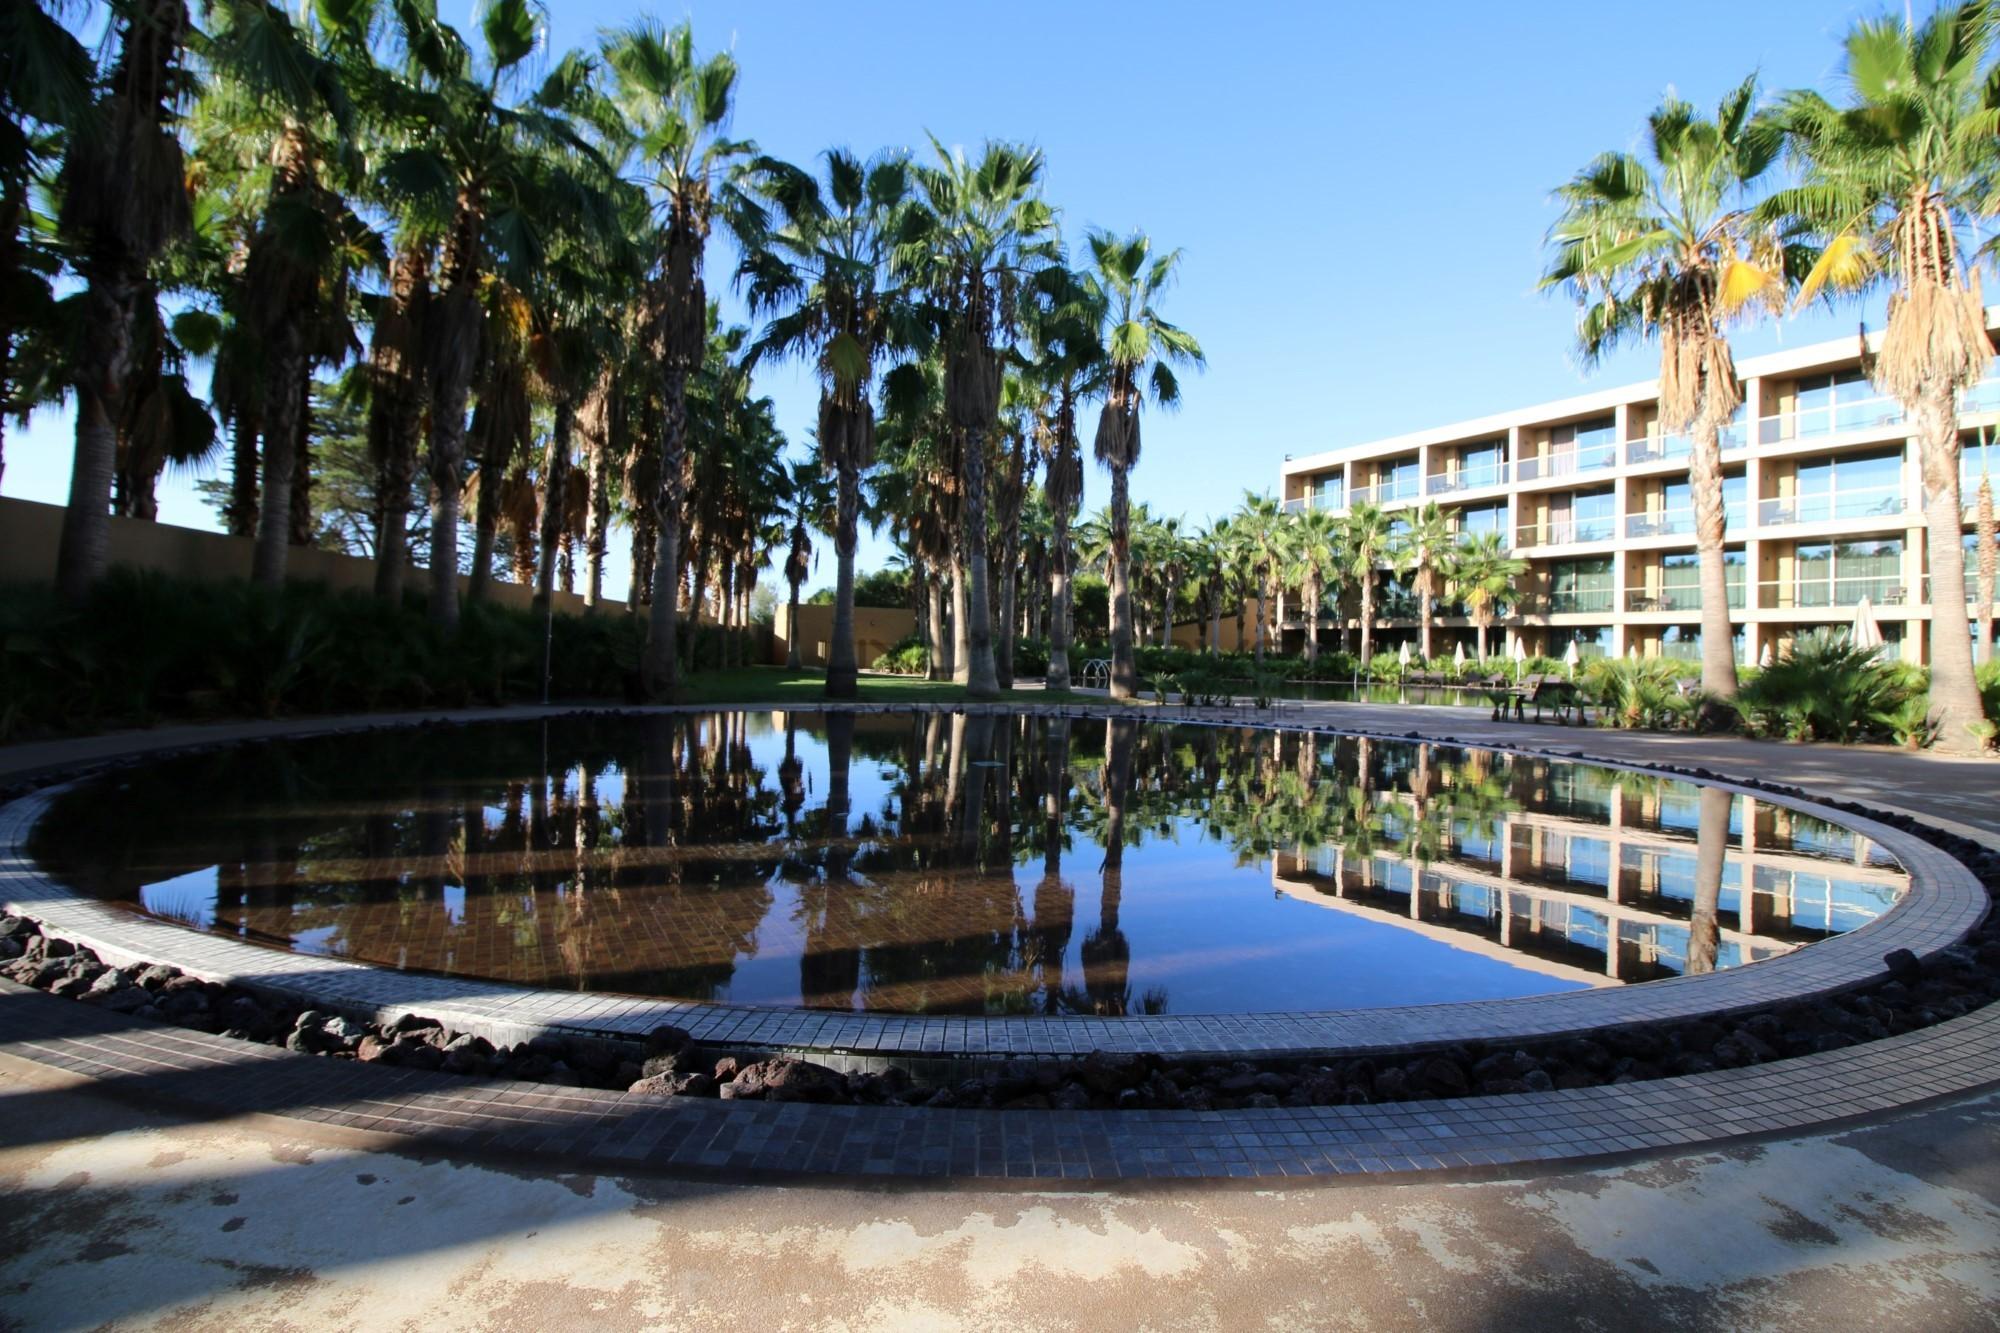 Lago_Montargil_Portugal_Hotel_Pool